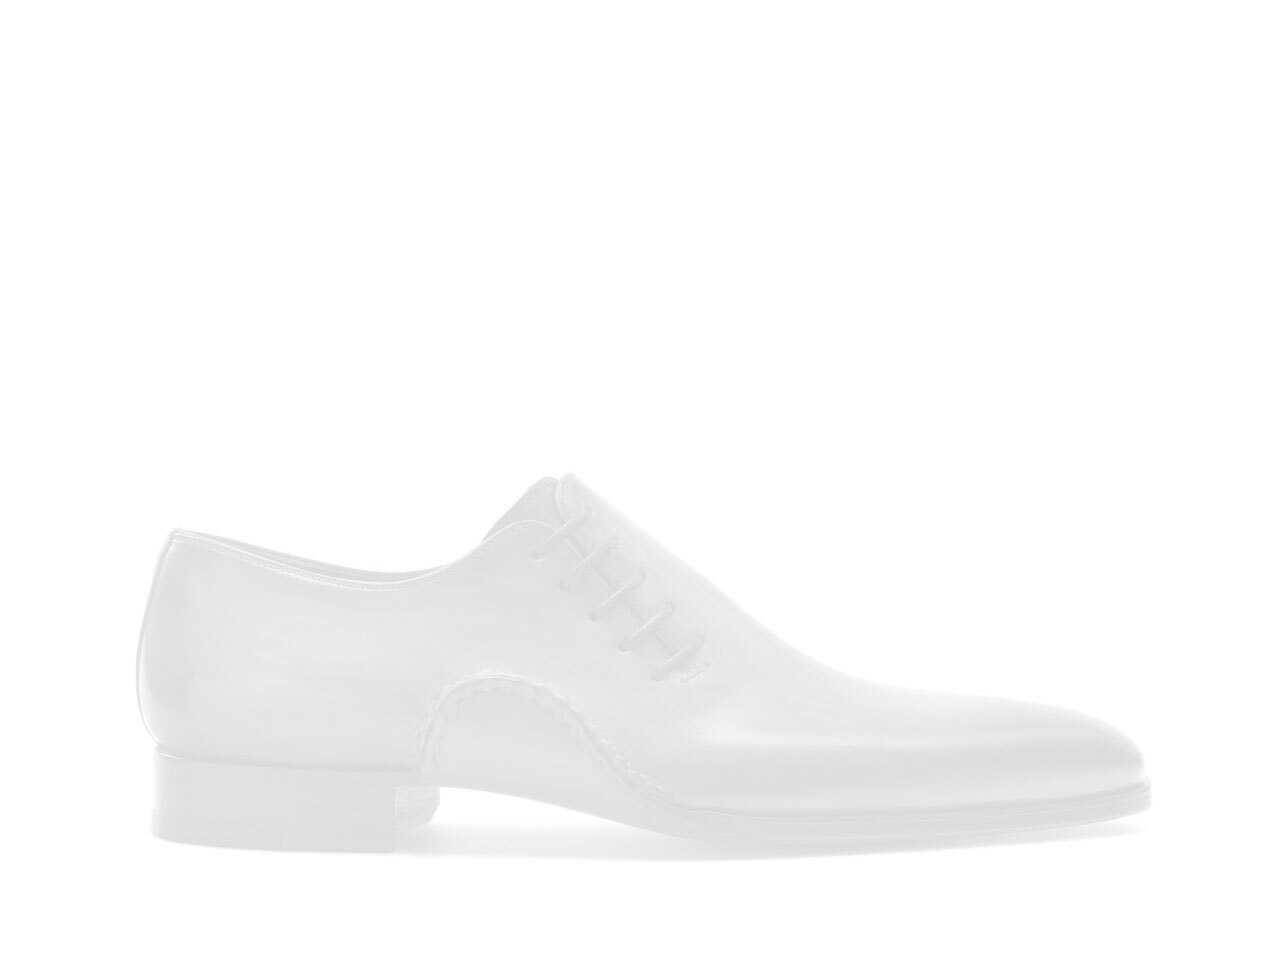 Sole of the Magnanni Playa Perf Grey Men's Sandal Slides